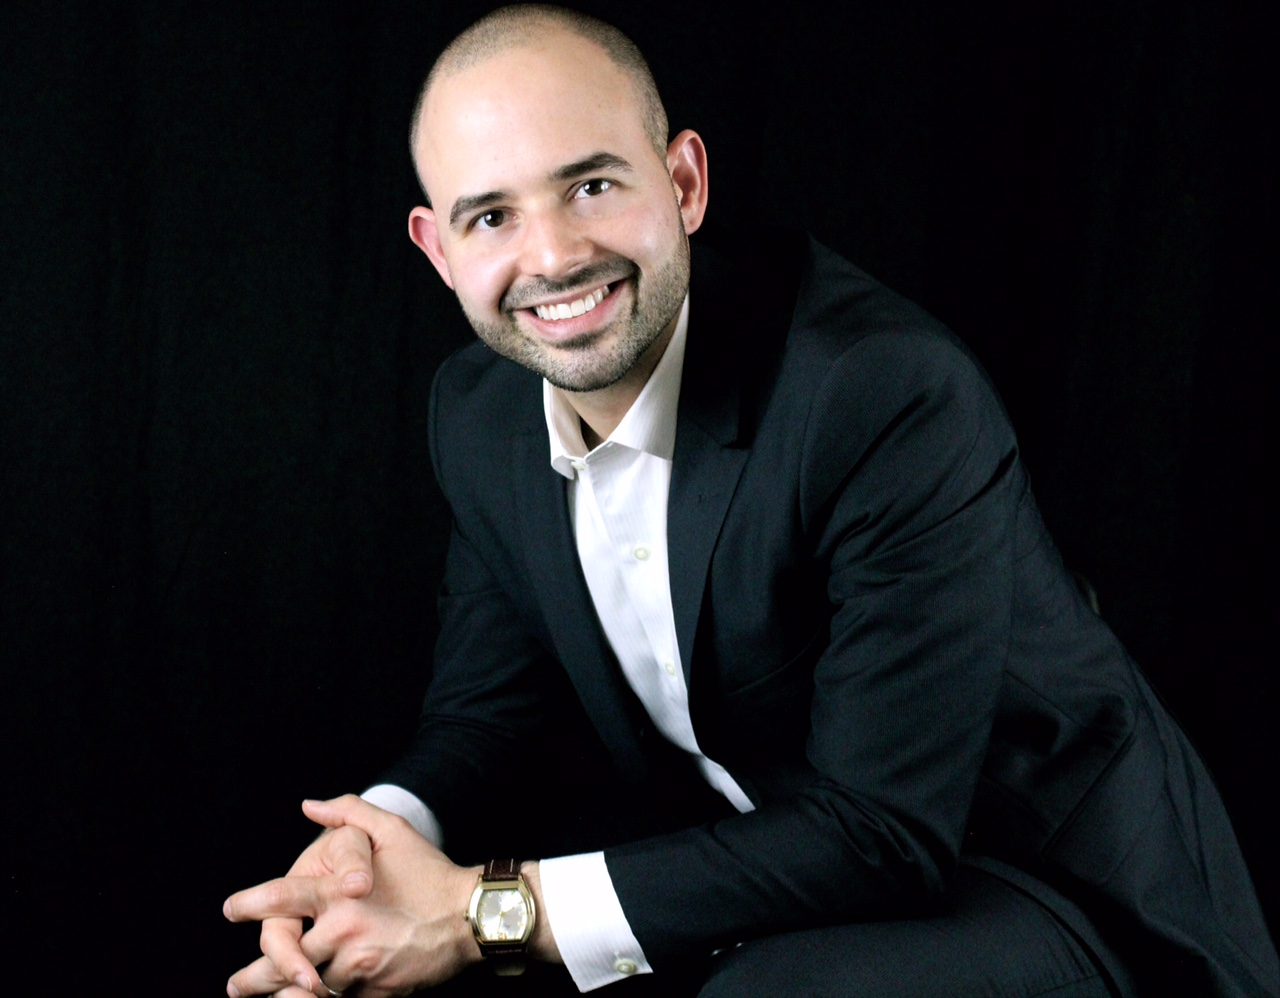 Adam Garcia, Pharmaceuticals Sales Rep & 5Linxs Entrepreneur